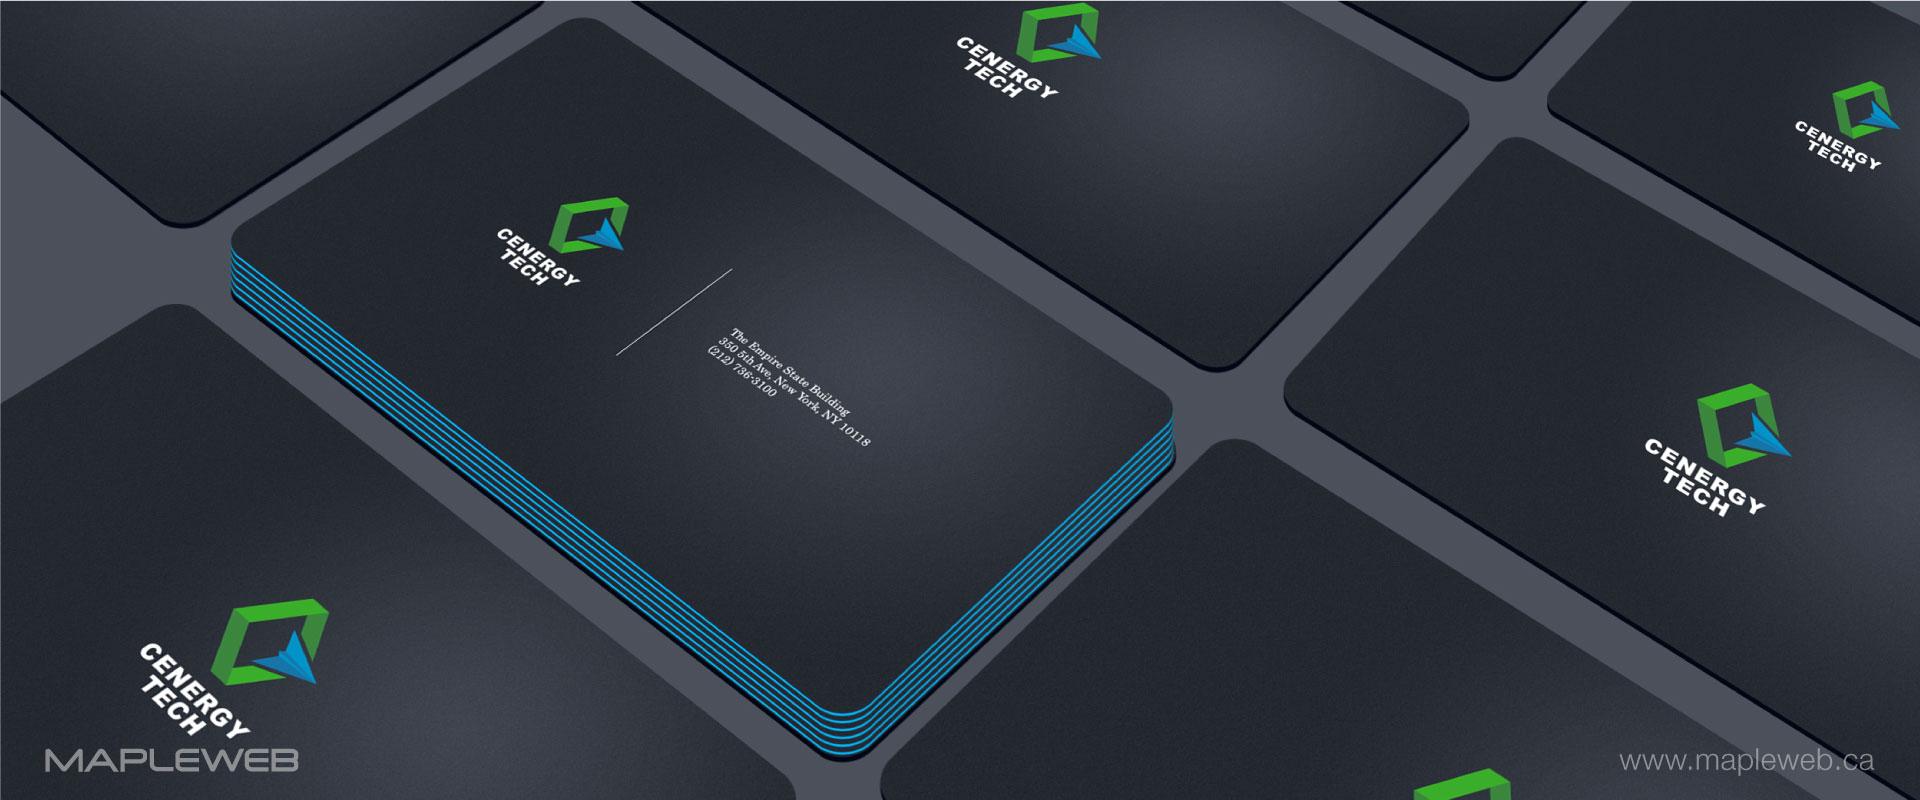 cenergy-tech-brand-logo-design-by-mapleweb-vancouver-canada-business-card-mock